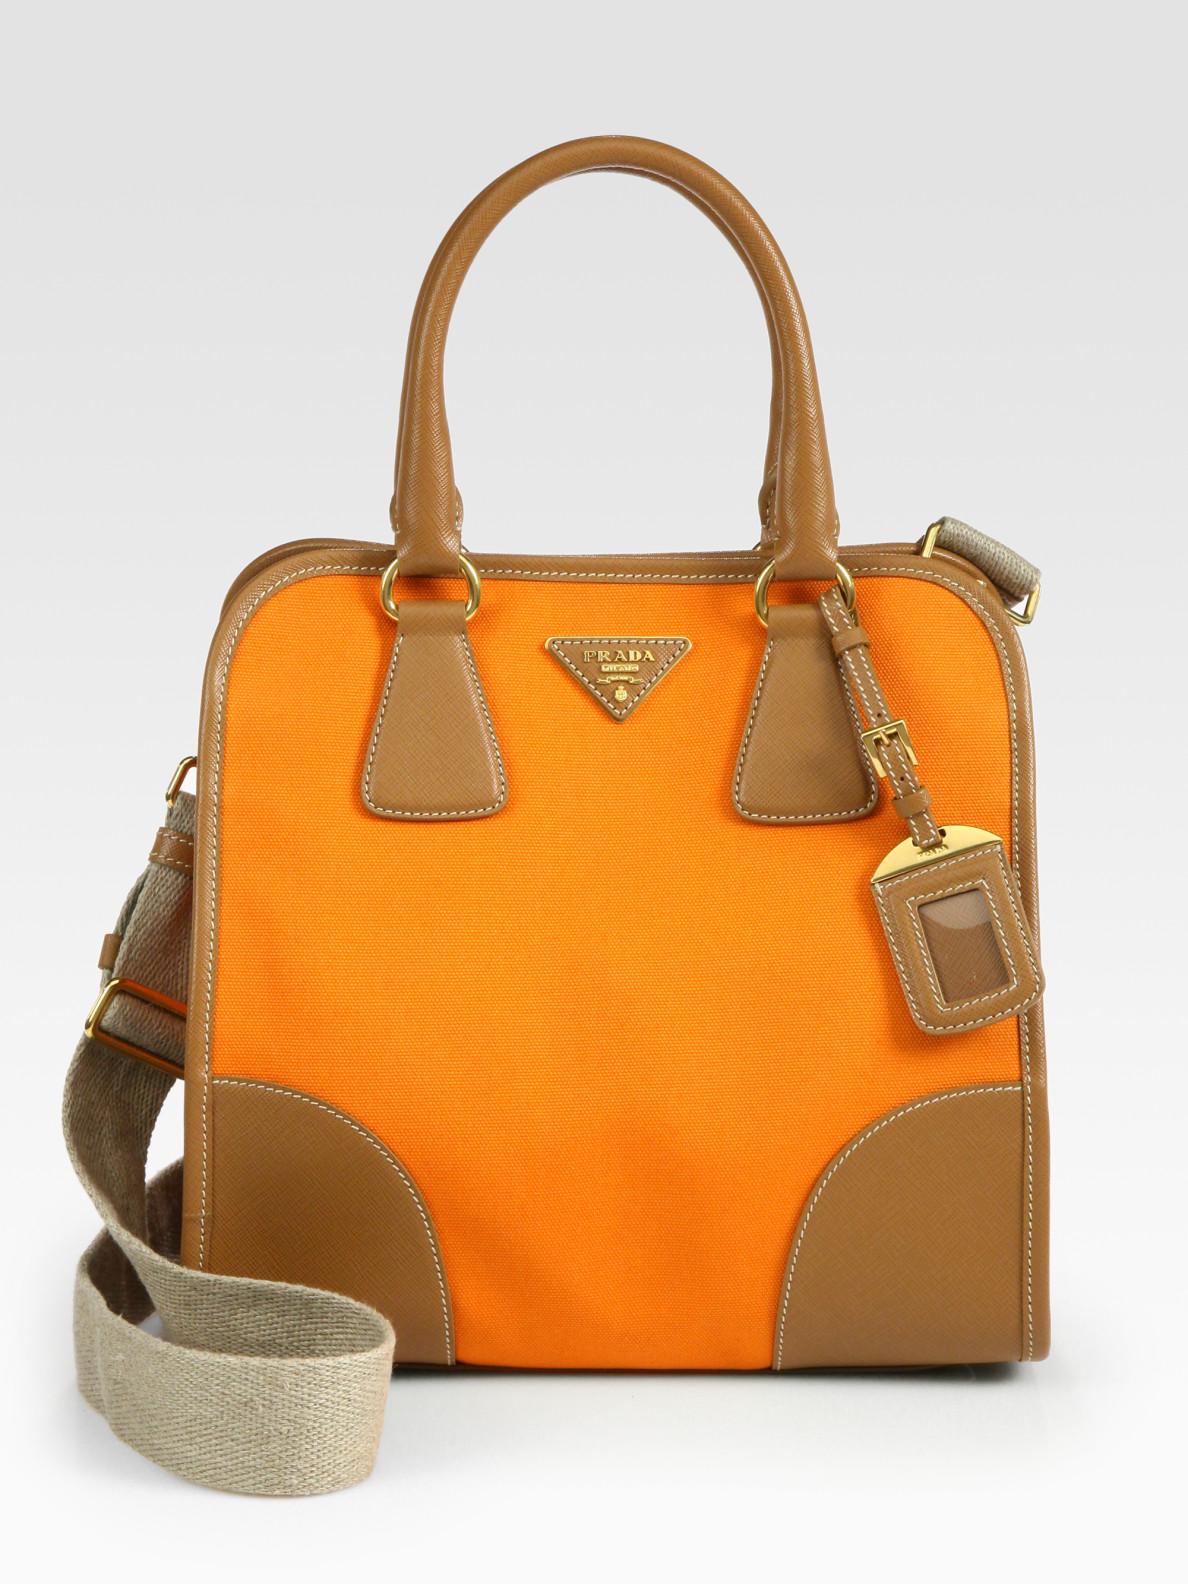 daf502a8f5f675 Prada Saffiano Leather & Canvas Tote Bag in Orange - Lyst